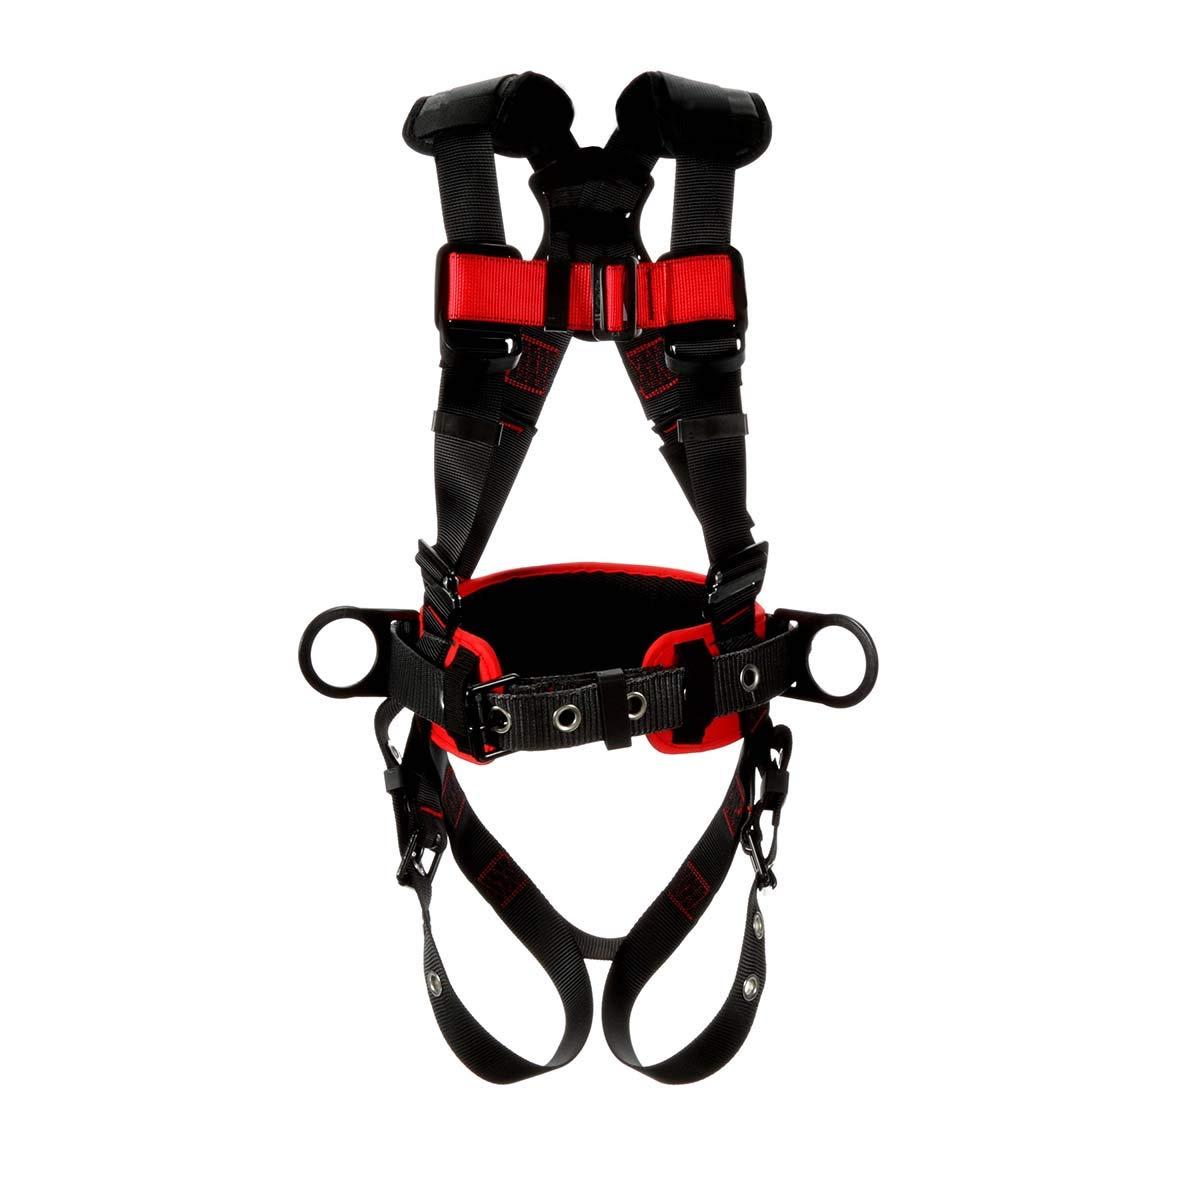 3M Protecta Construction Style Positioning Harness 1161309, Black, Medium/Large, 1 EA